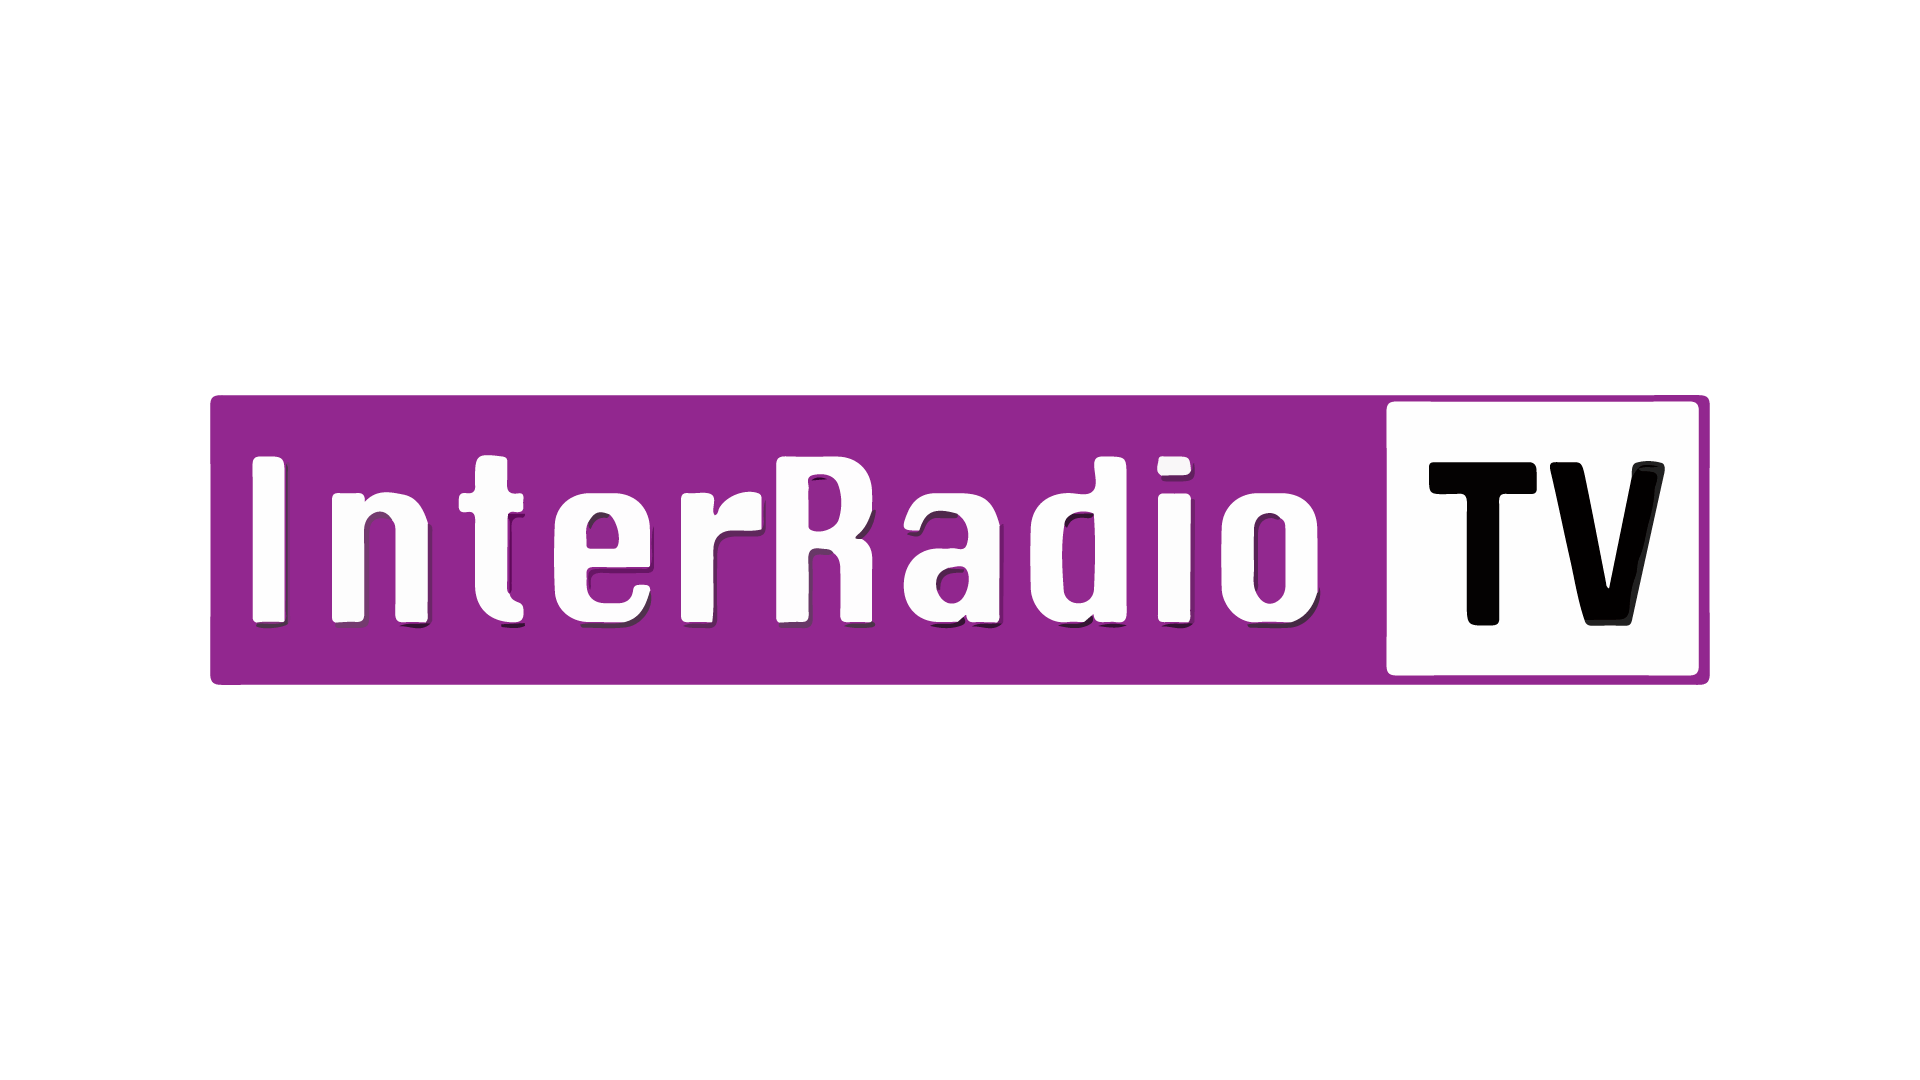 Interradio TV Chile en vivo, Online